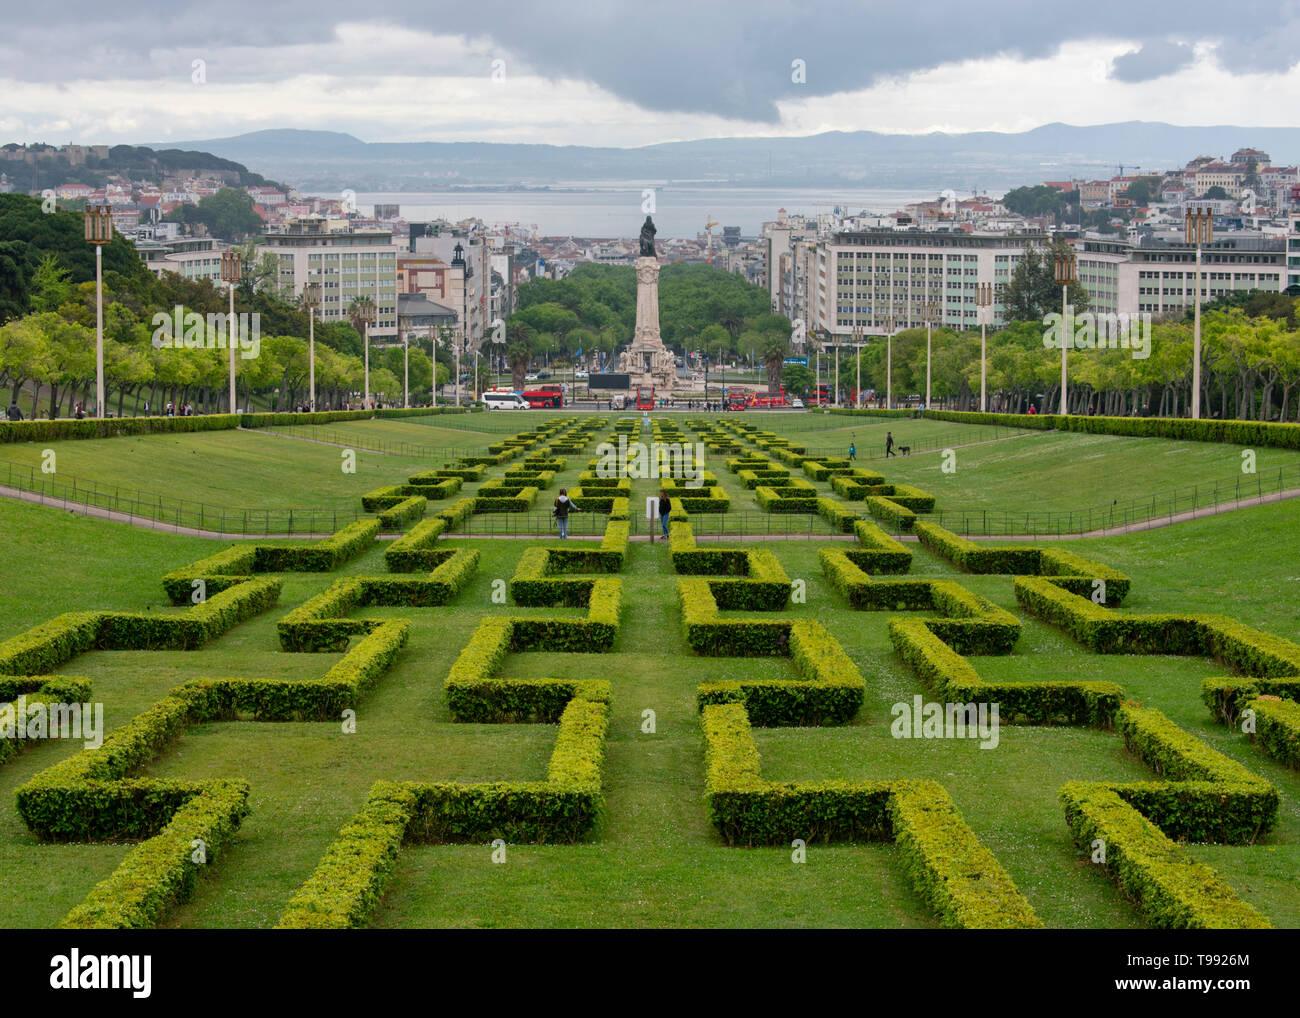 Eduardo VII park in Lisbon, Portugal. - Stock Image